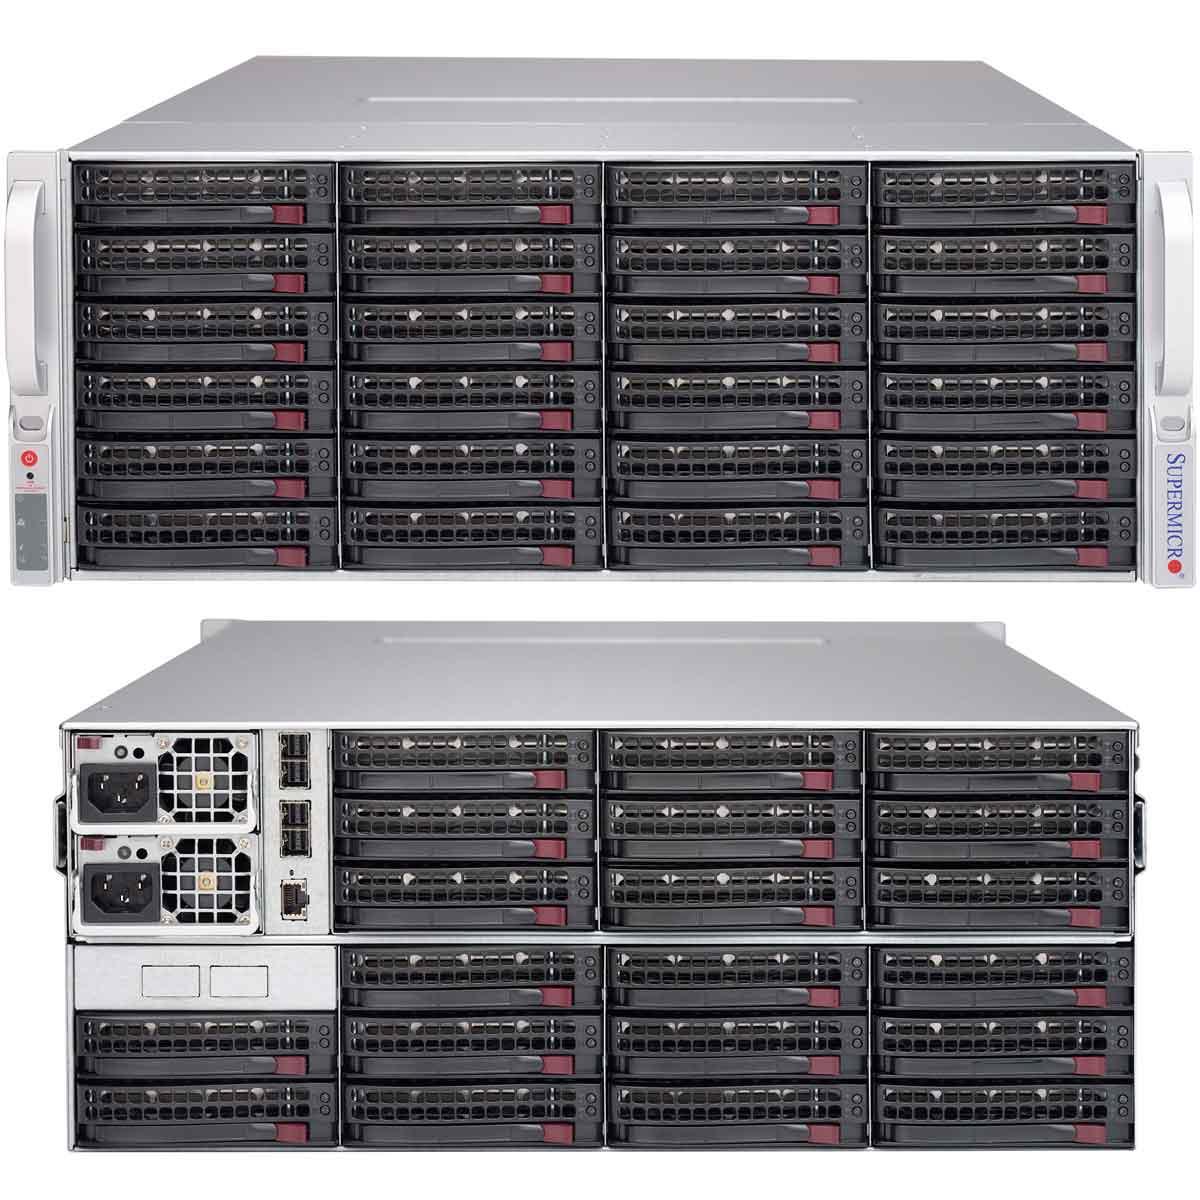 sc847E1C-R1K28JBOD_front-back-1200×1200